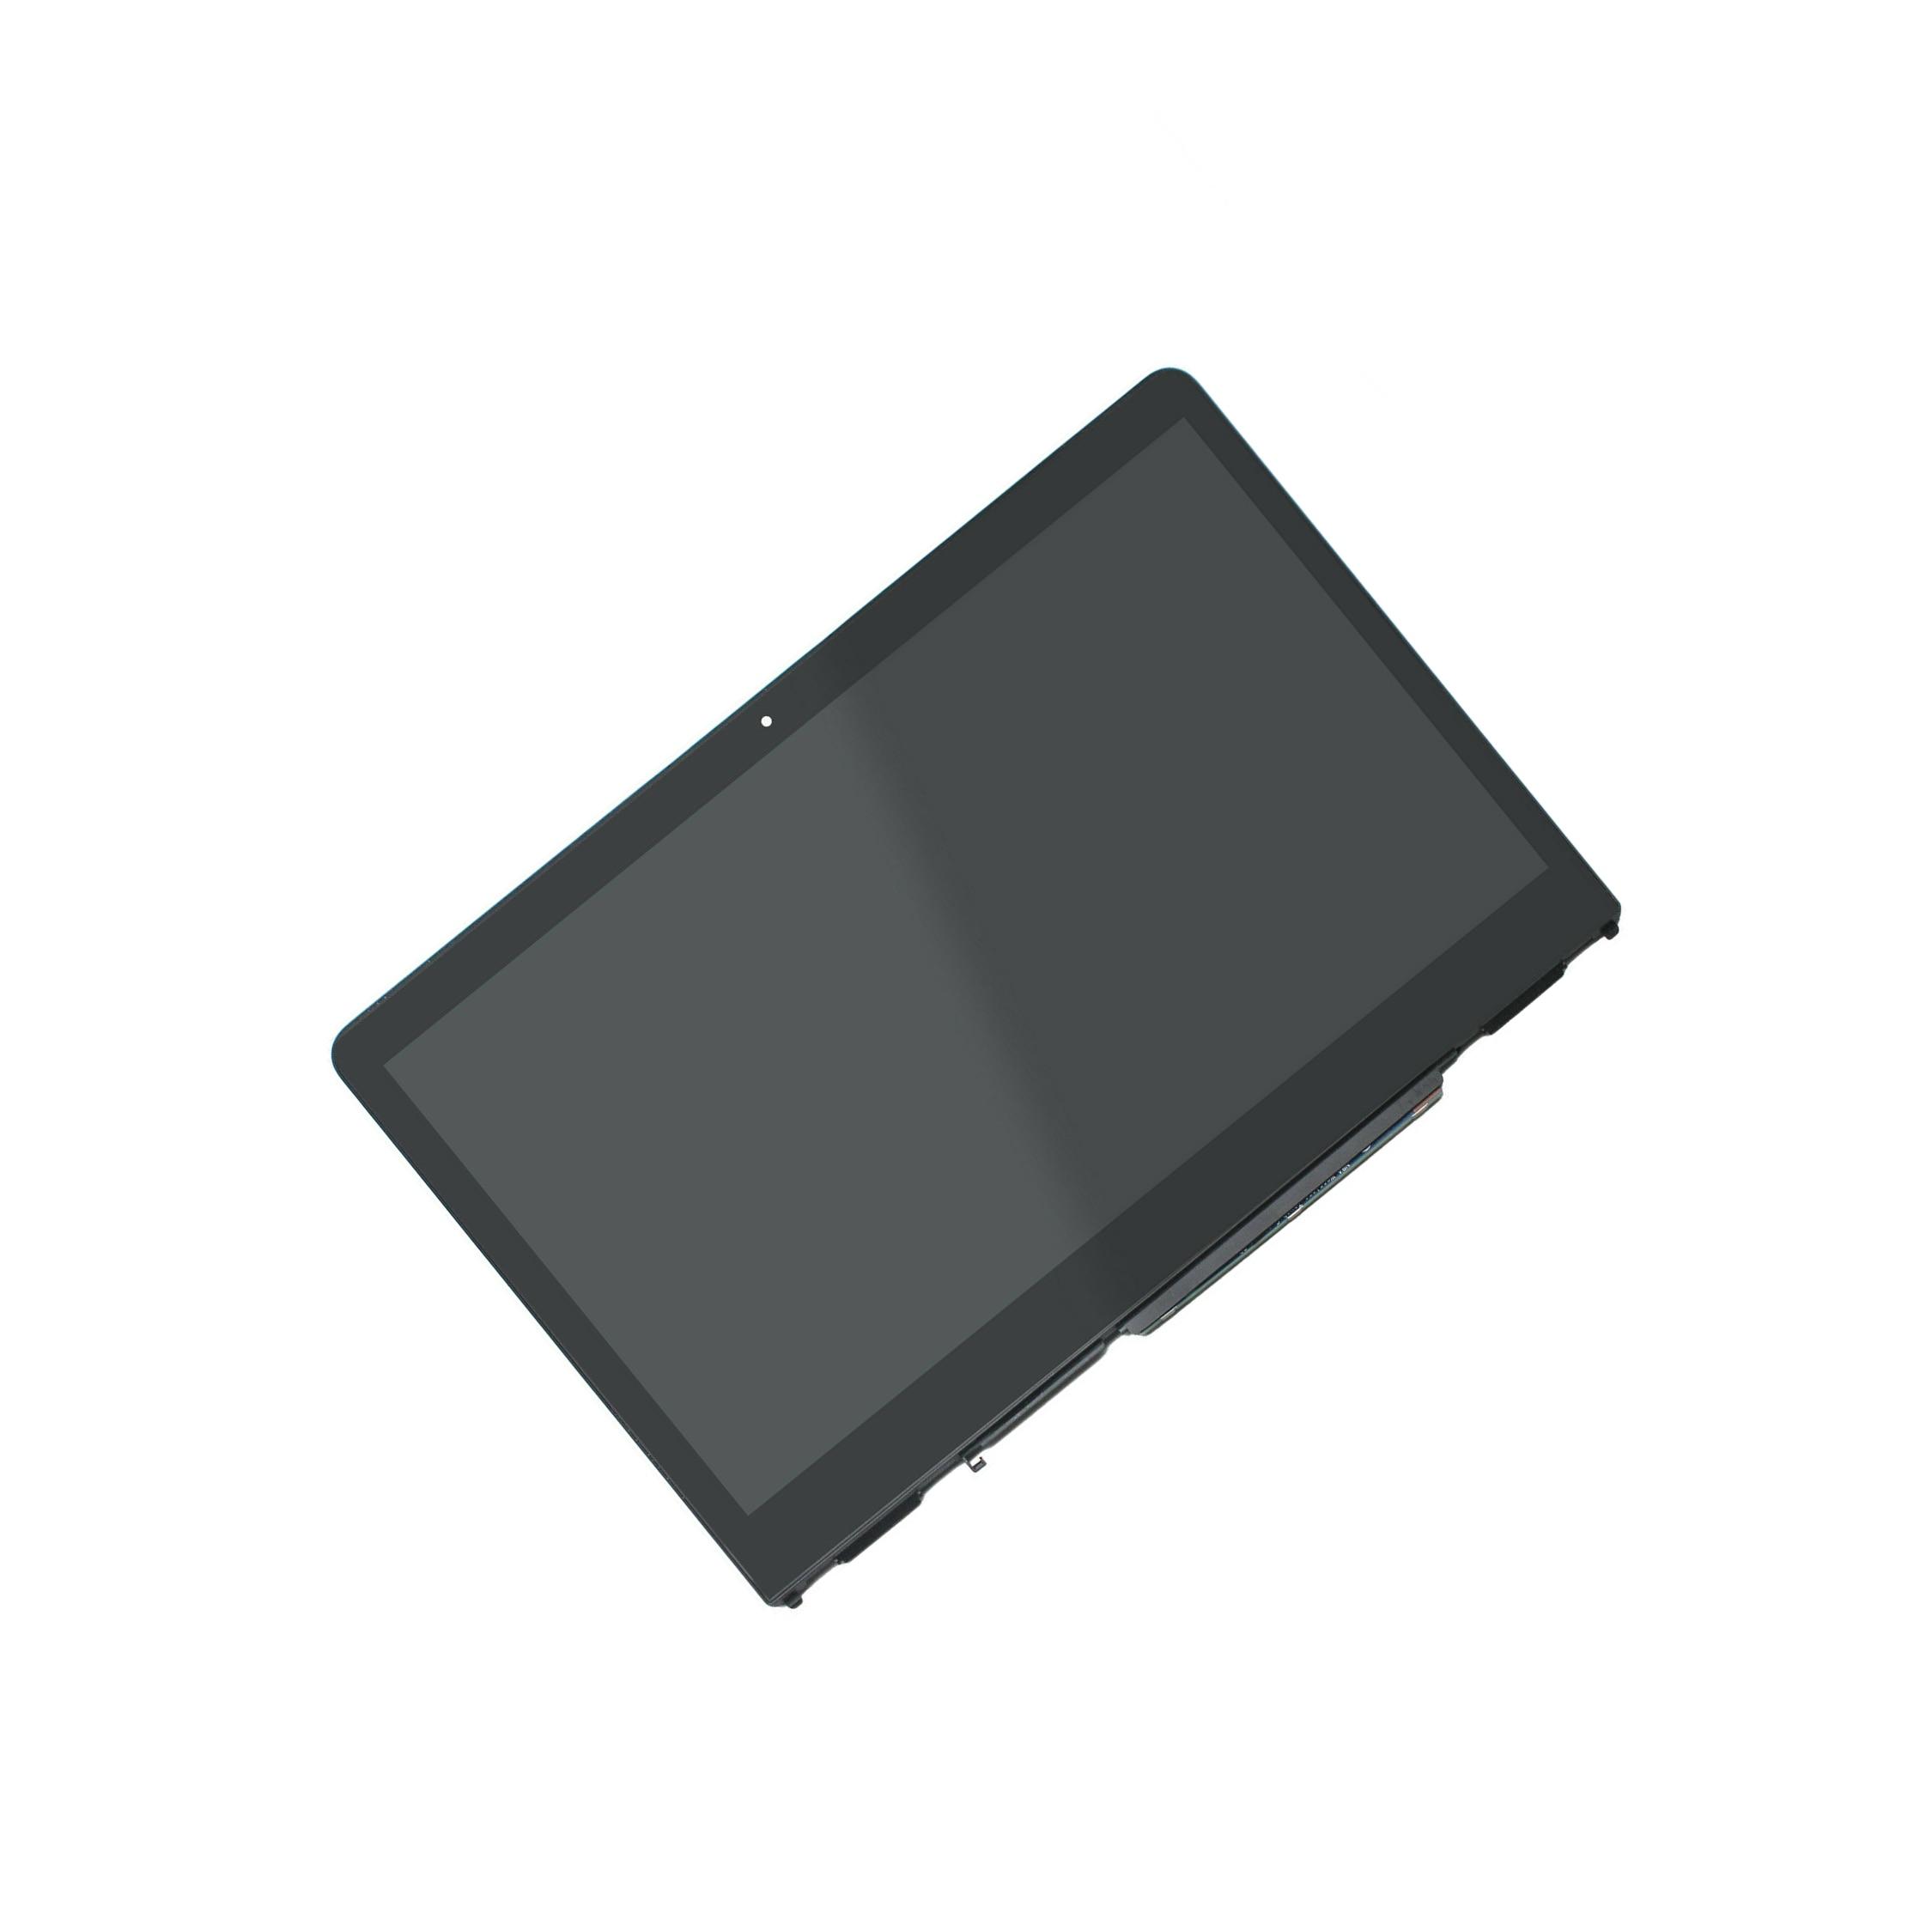 JIANGLUN ensemble décran tactile LCD 14 pour HP pavillon X360 série 14-BA